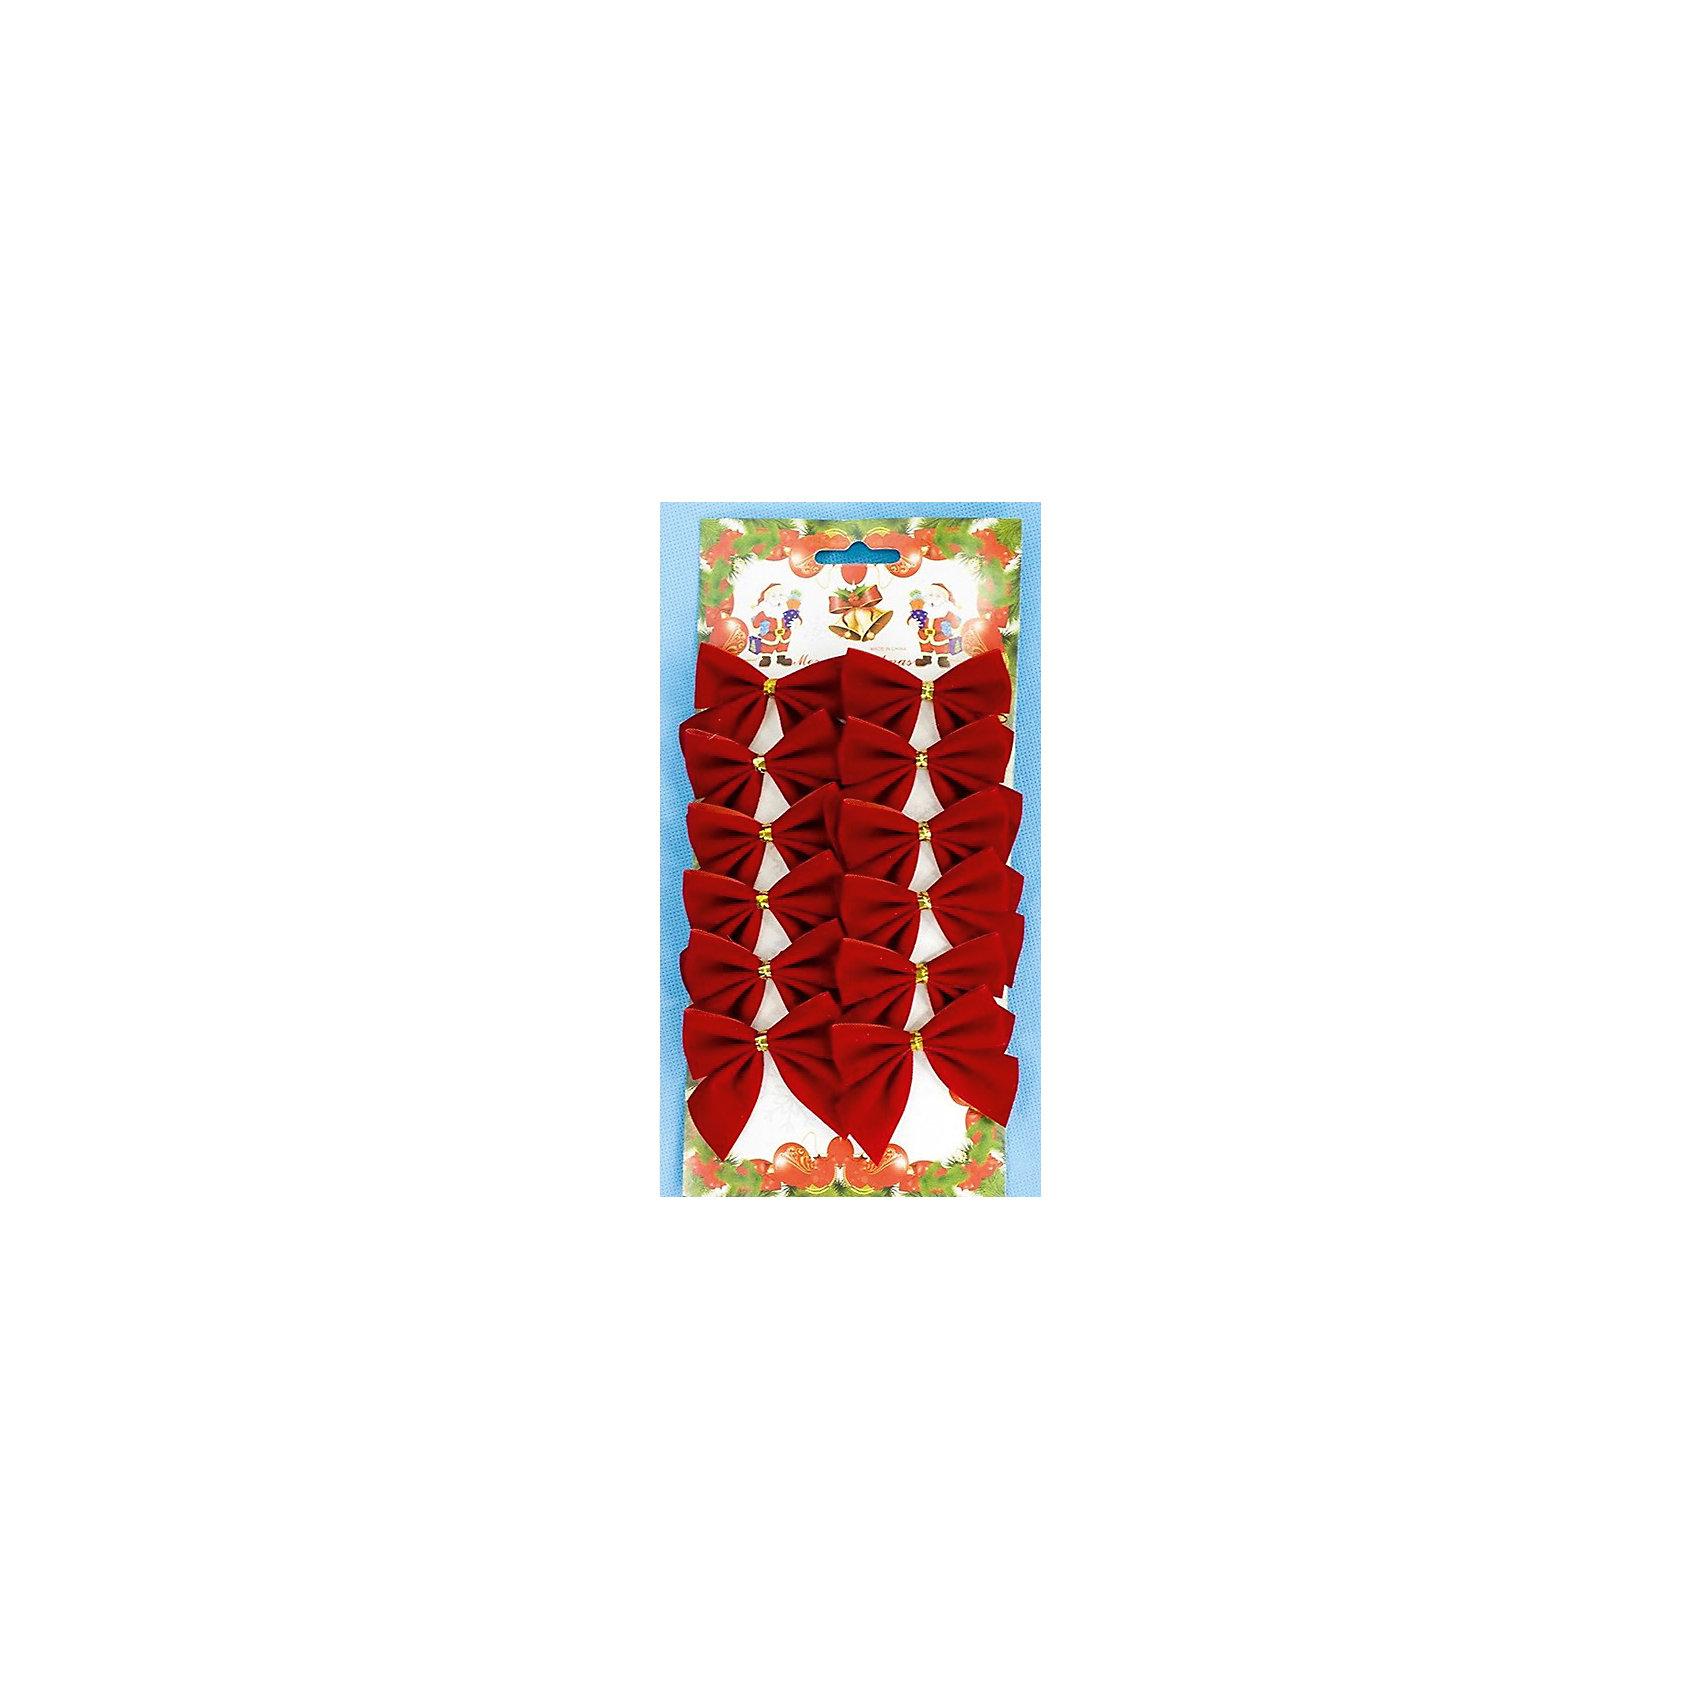 Новогоднее украшение Красный бантУкрашение новогоднее БАНТ Красные арт.42761 / 5х5<br><br>Ширина мм: 130<br>Глубина мм: 280<br>Высота мм: 5<br>Вес г: 30<br>Возраст от месяцев: 60<br>Возраст до месяцев: 600<br>Пол: Унисекс<br>Возраст: Детский<br>SKU: 5144586